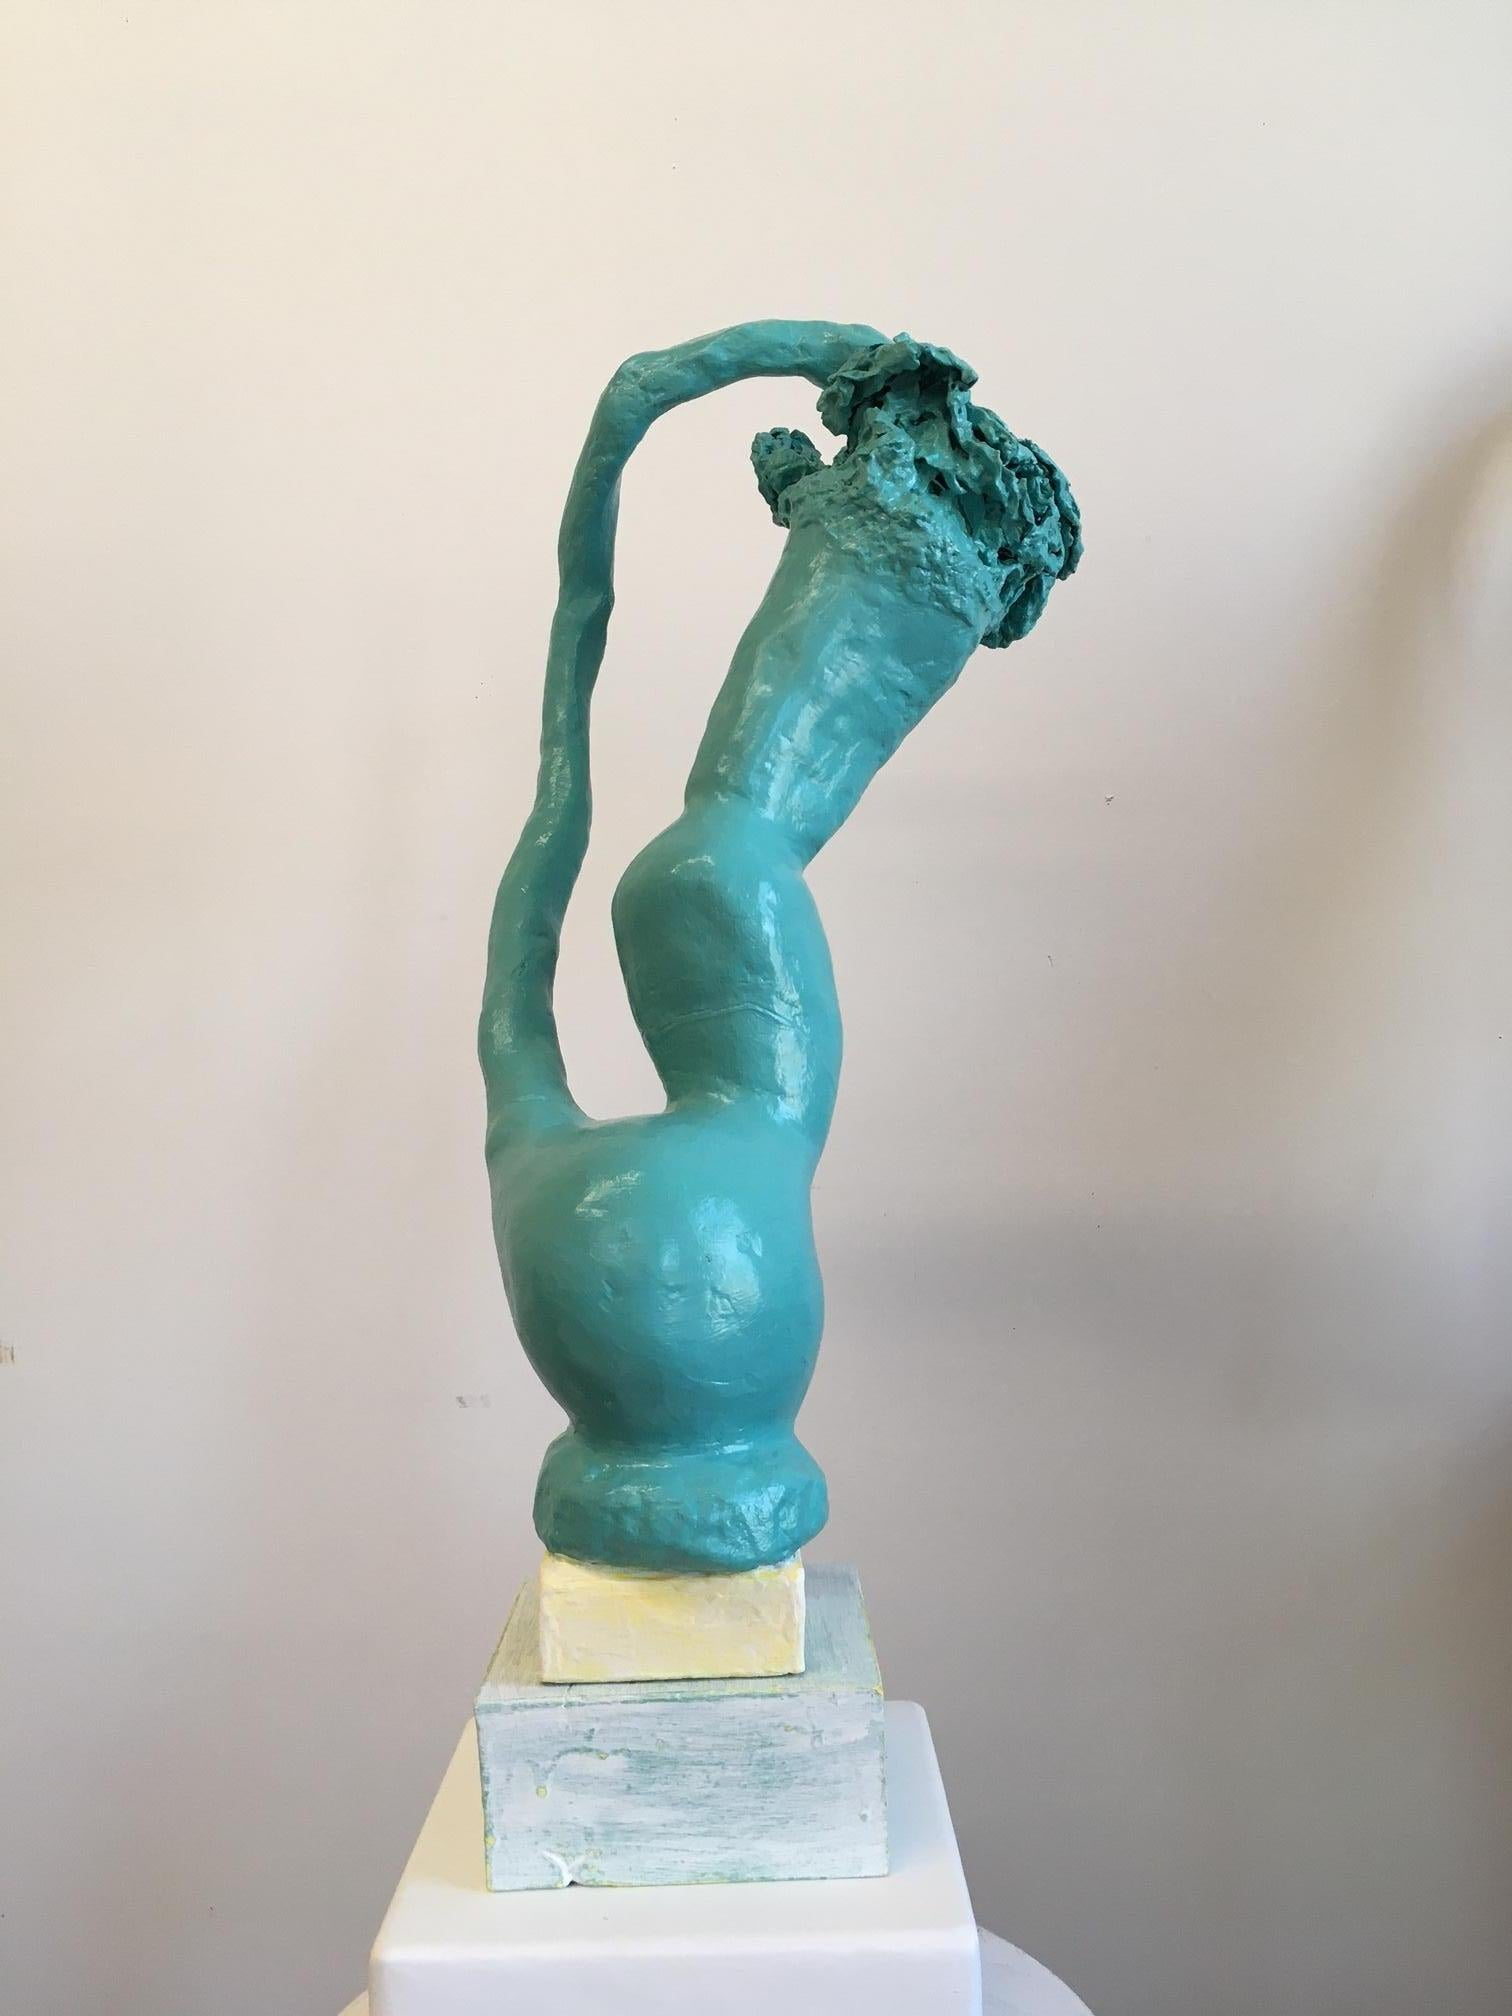 Contemporary Conceptual Ceramic Sculpture Turquoise Female Artist Unique Object